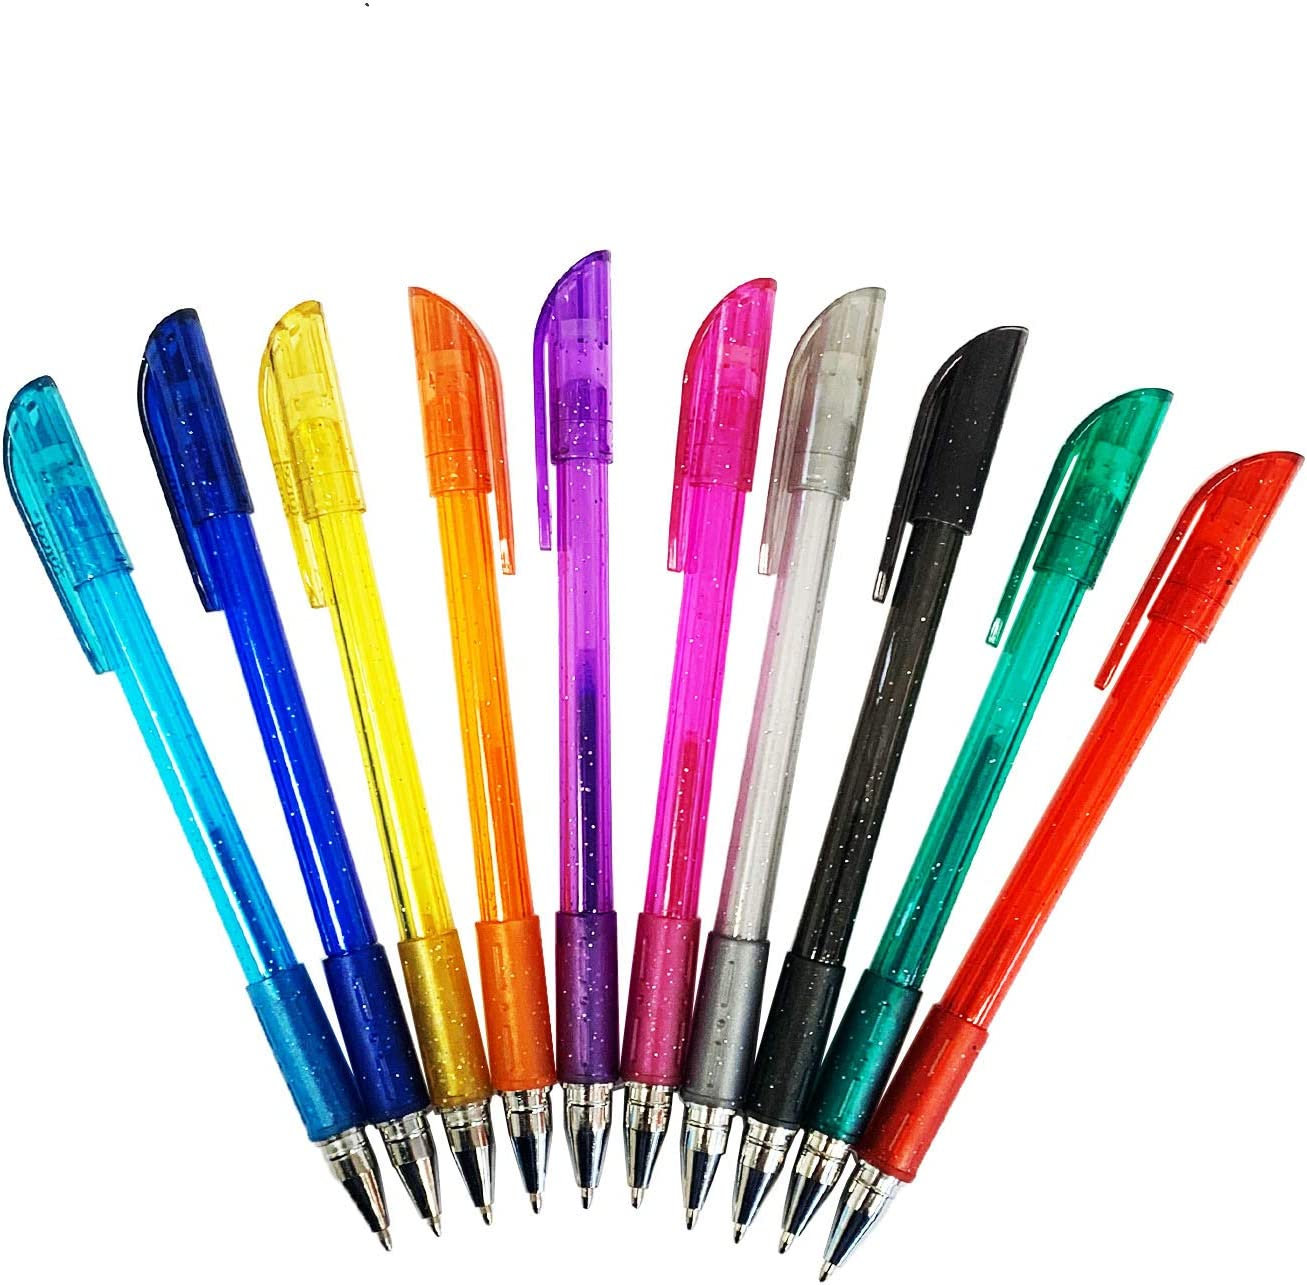 FORCEL Pack 10 bolígrafos Tinta Gel con Purpurina: Amazon.es: Hogar